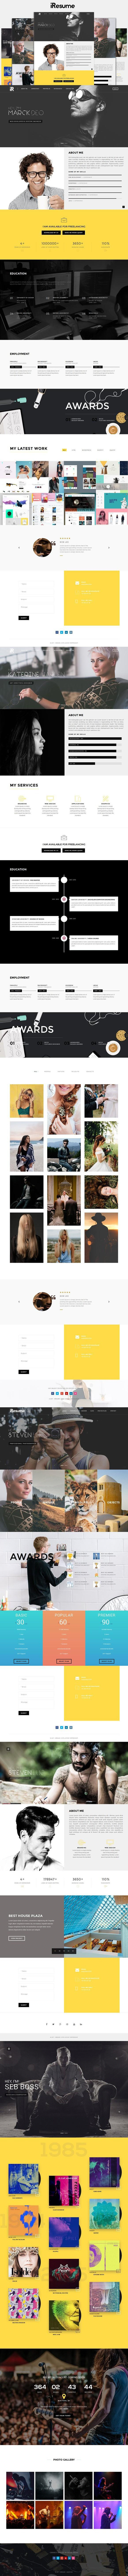 iResume -Personal Resume & Portfolio. HTML/CSS Themes. $18.00